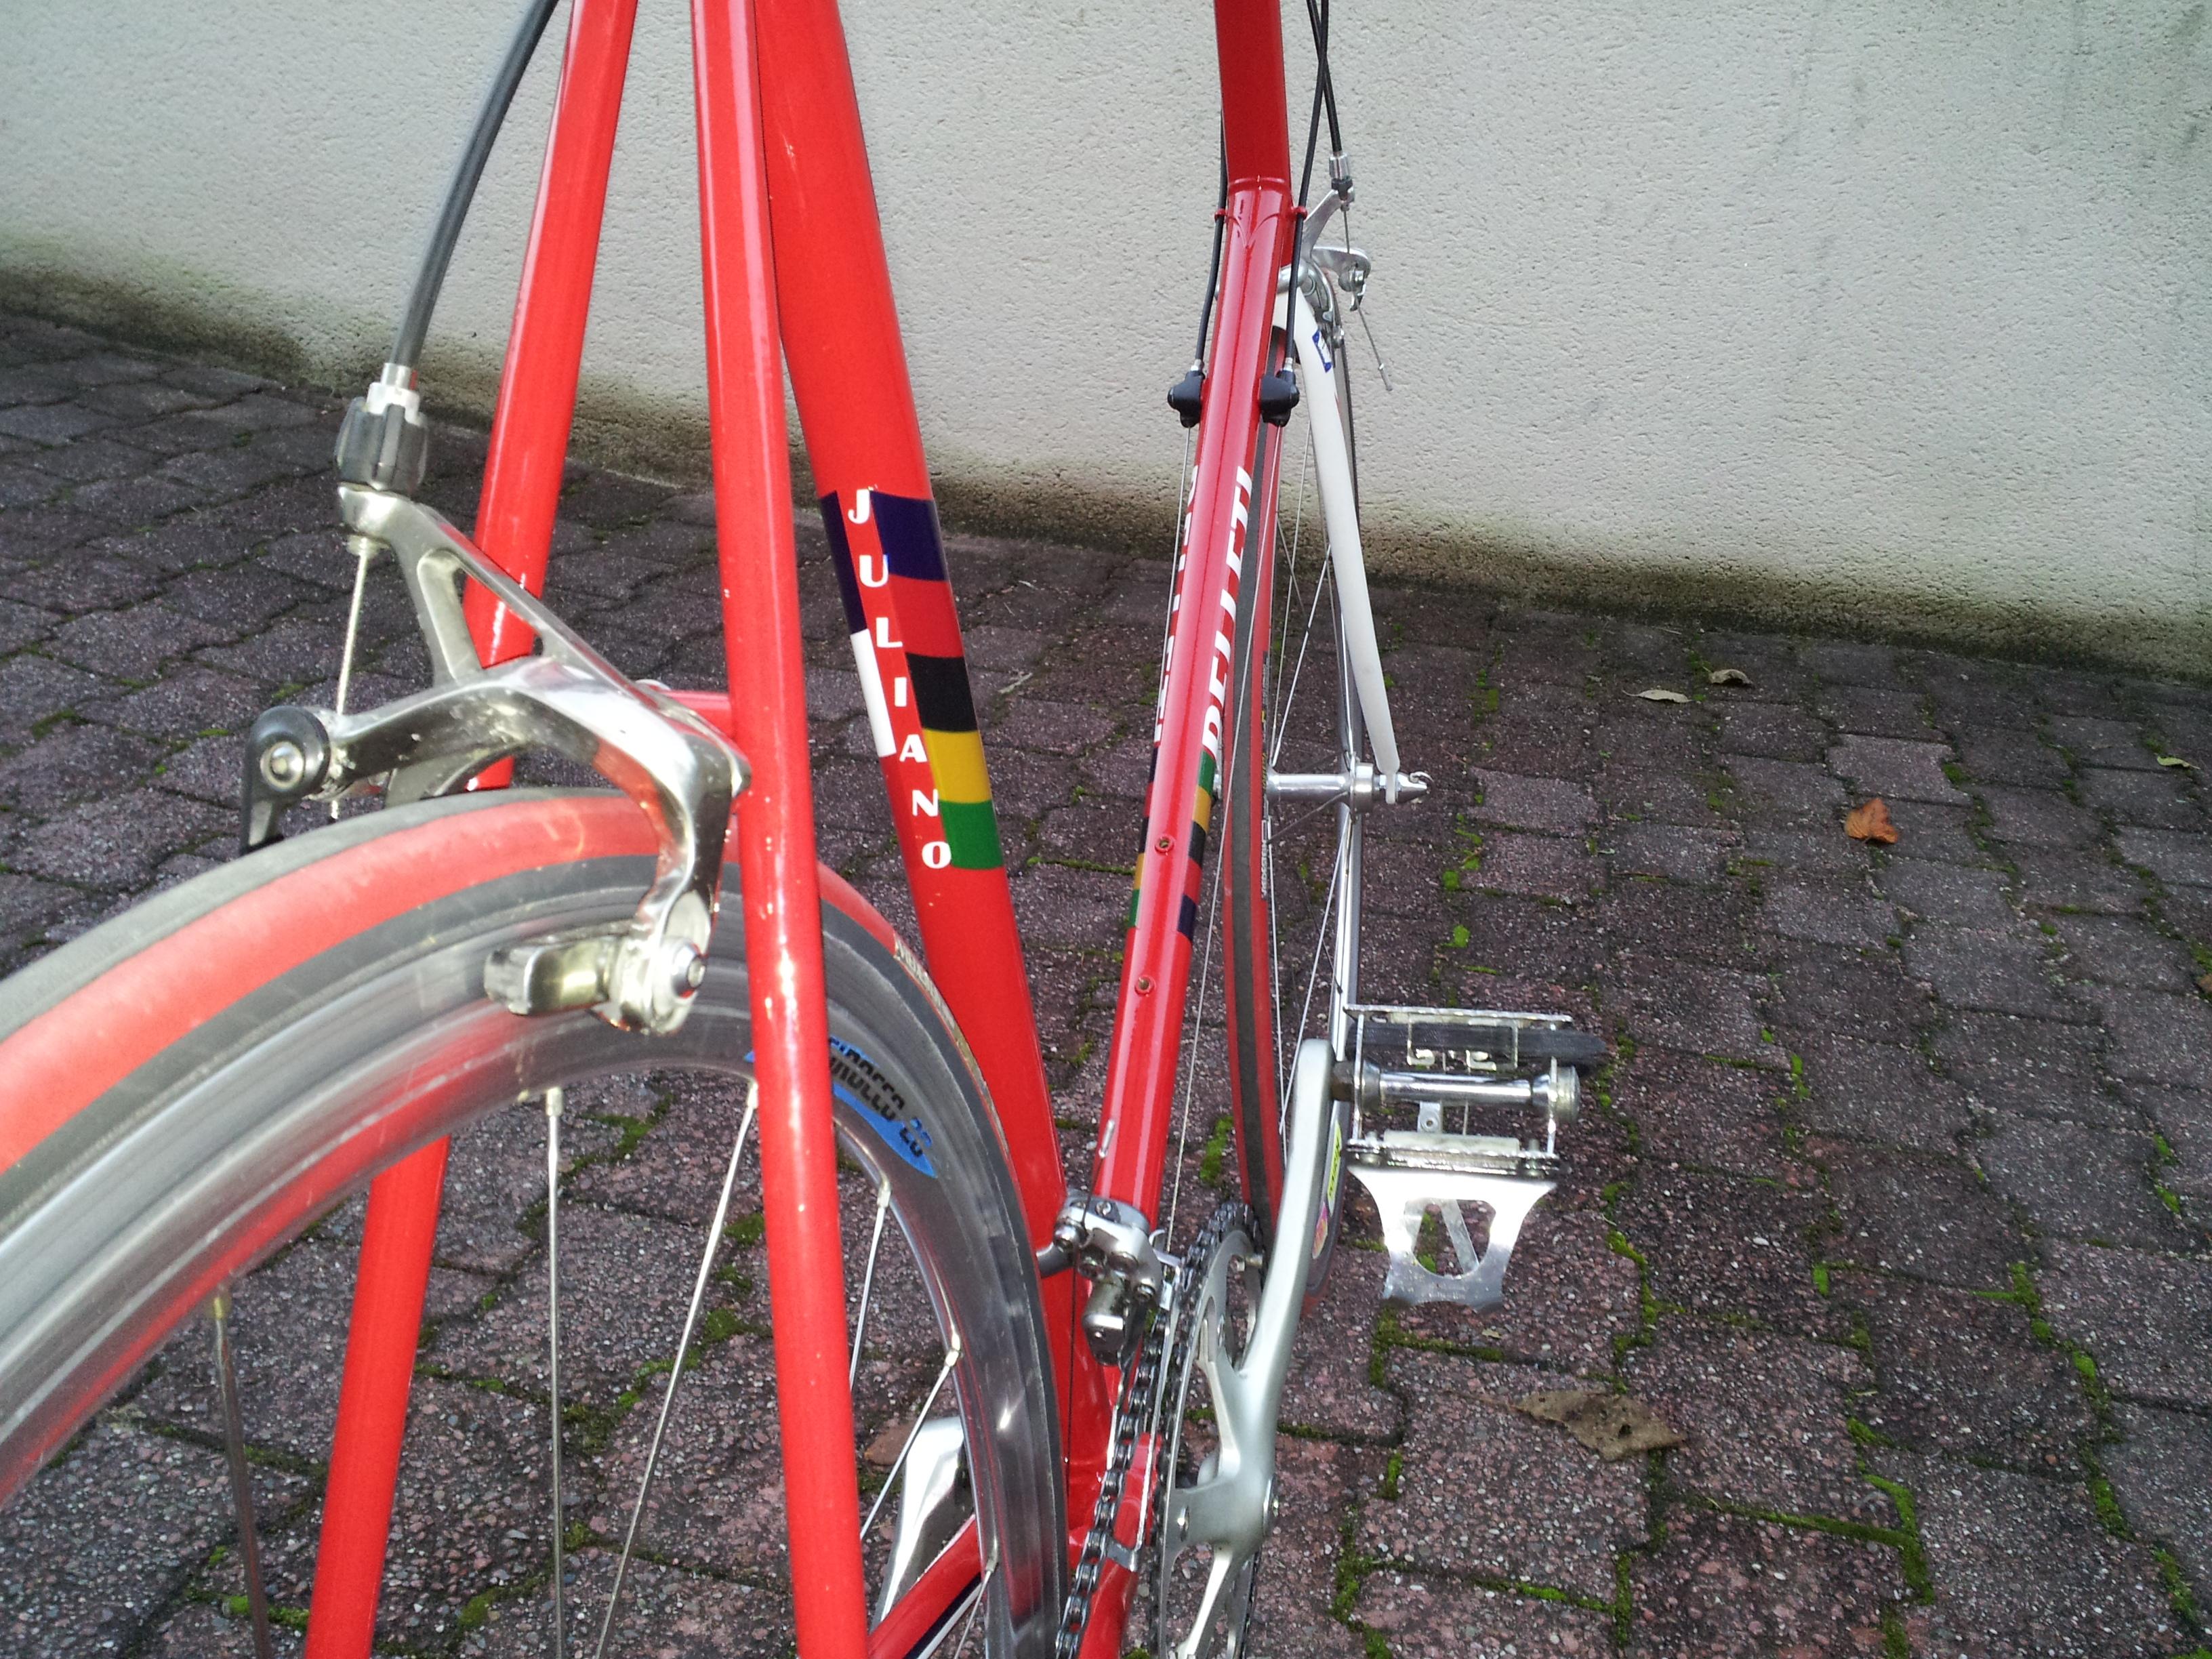 Le Belleti : Vélo perso - Vélotaf course - Page 2 131130054817612711779523